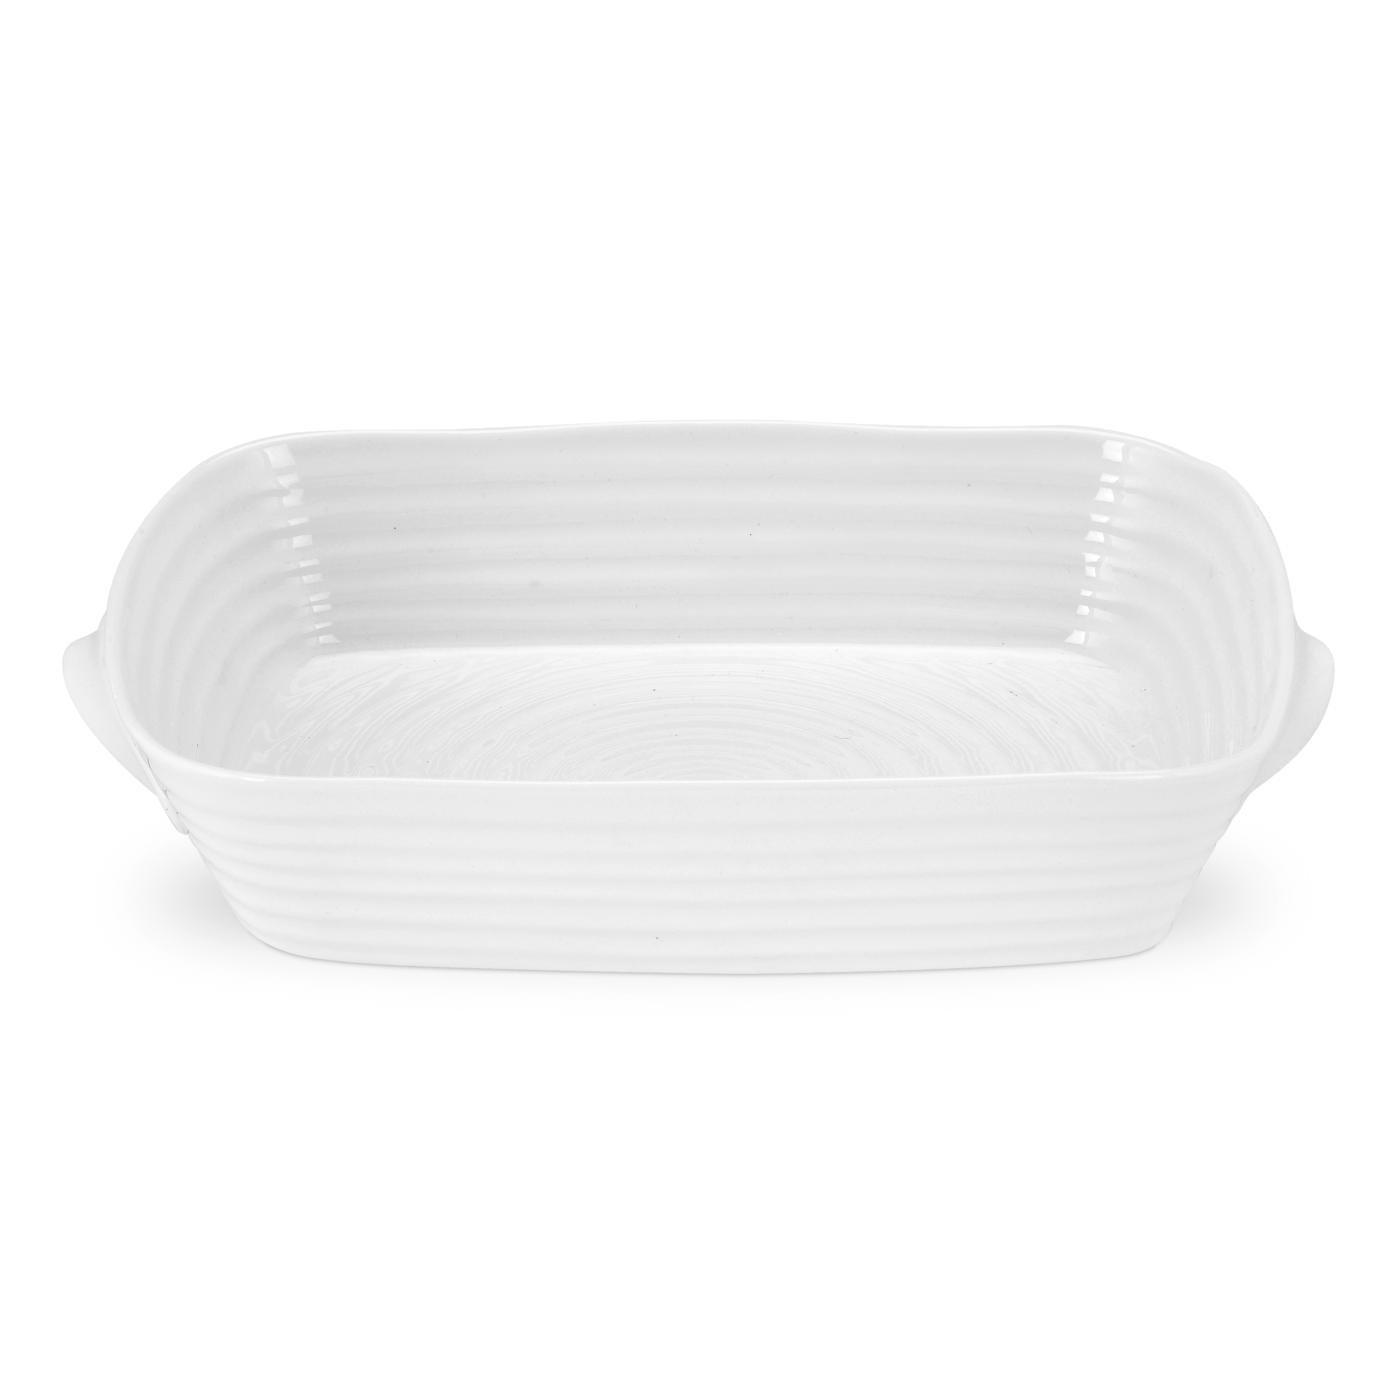 Portmeirion Sophie Conran White Medium Handled Rectangular Roasting Dish